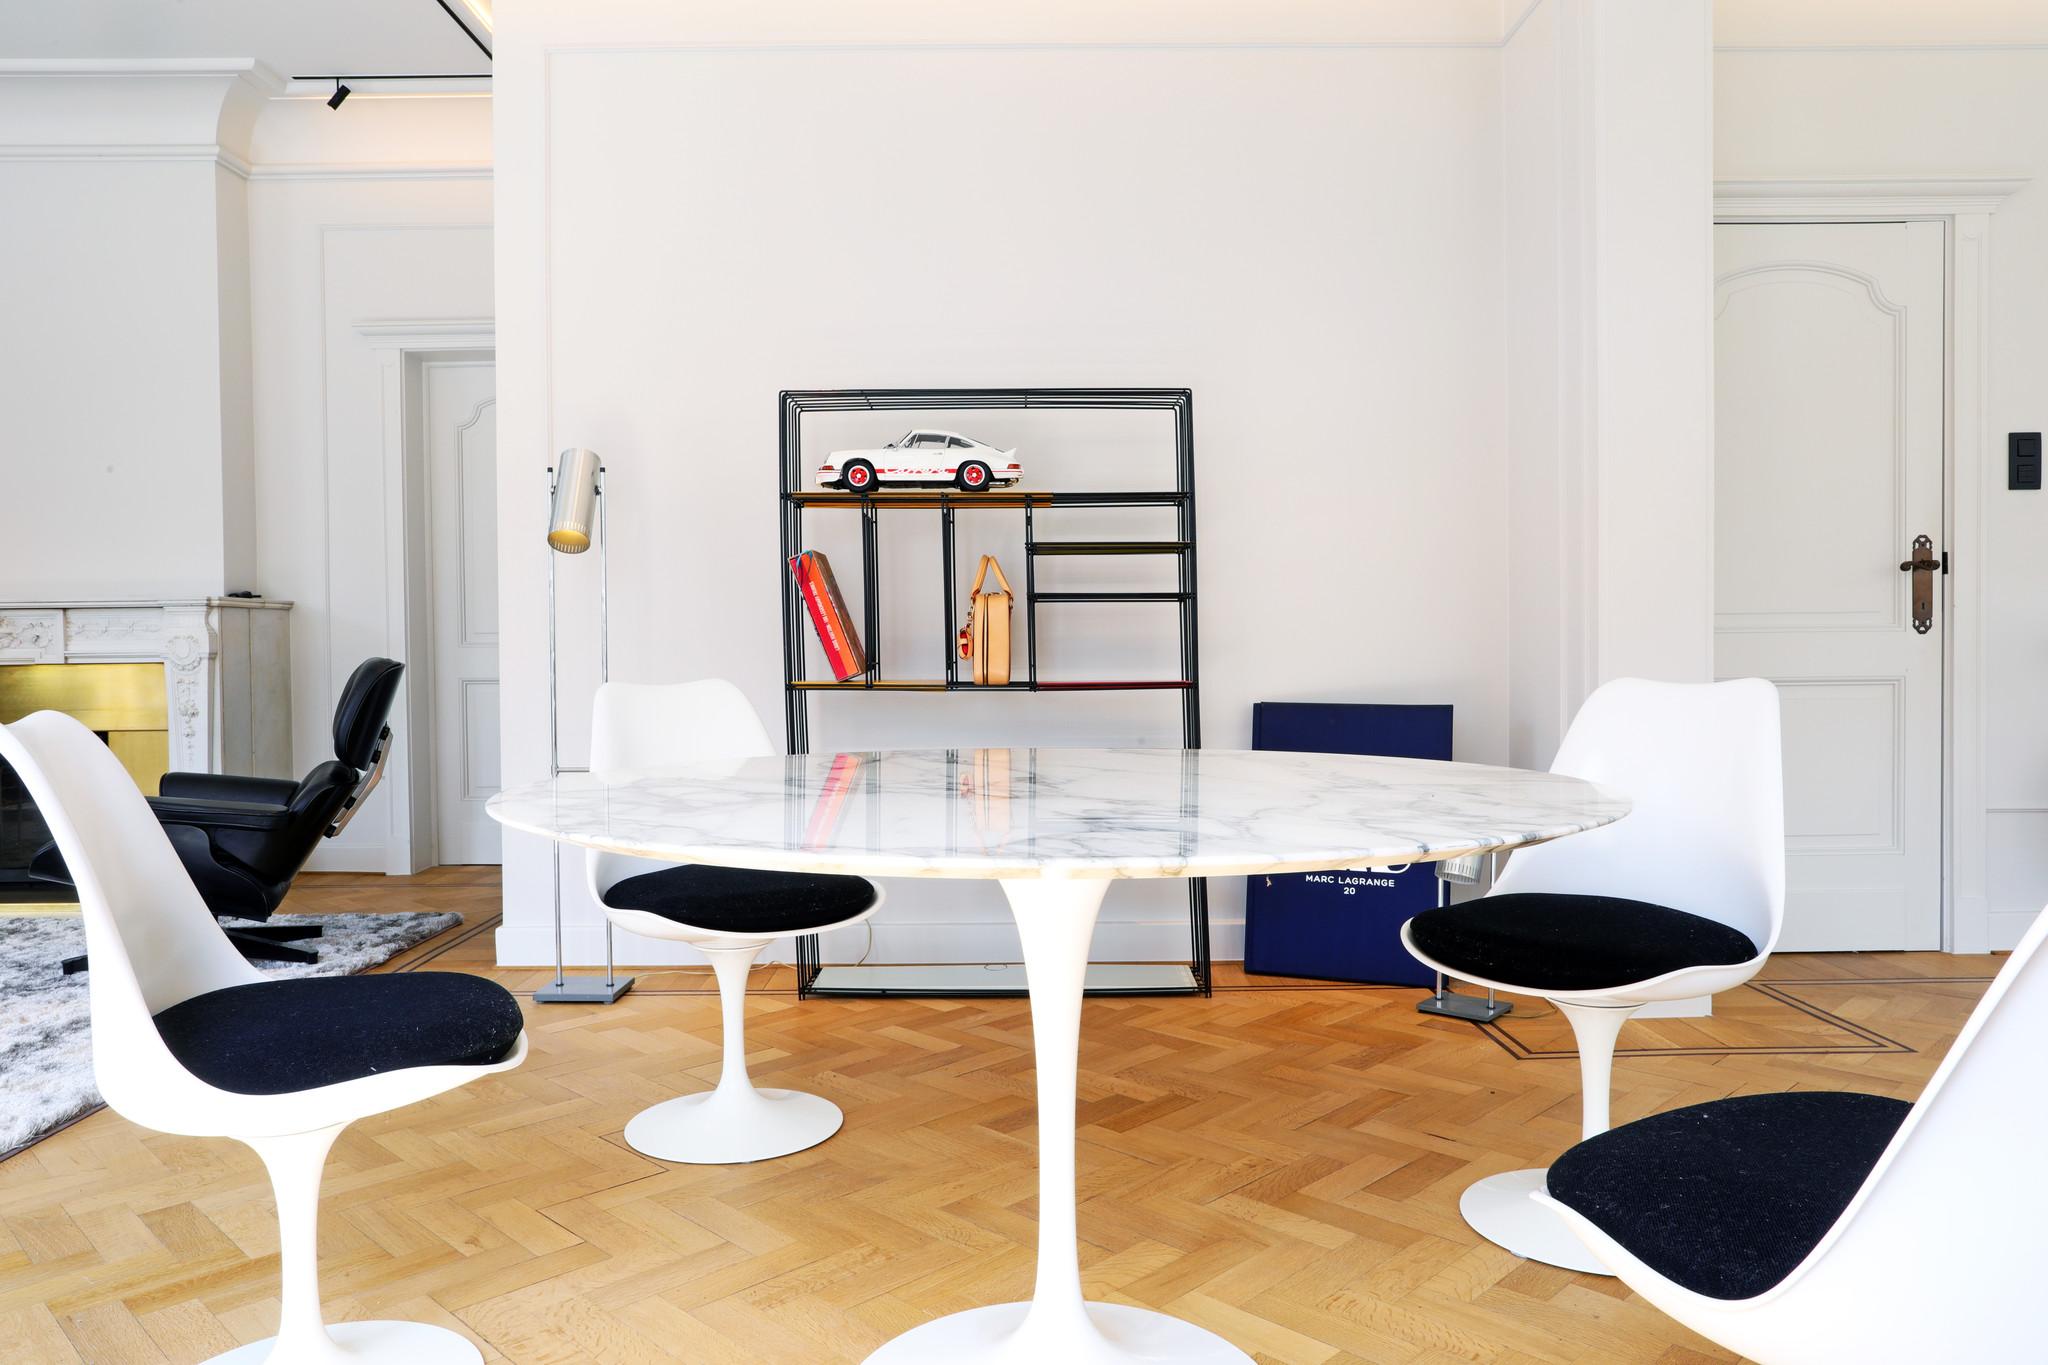 Knoll marble Tulip table designed by Eero Saarinen